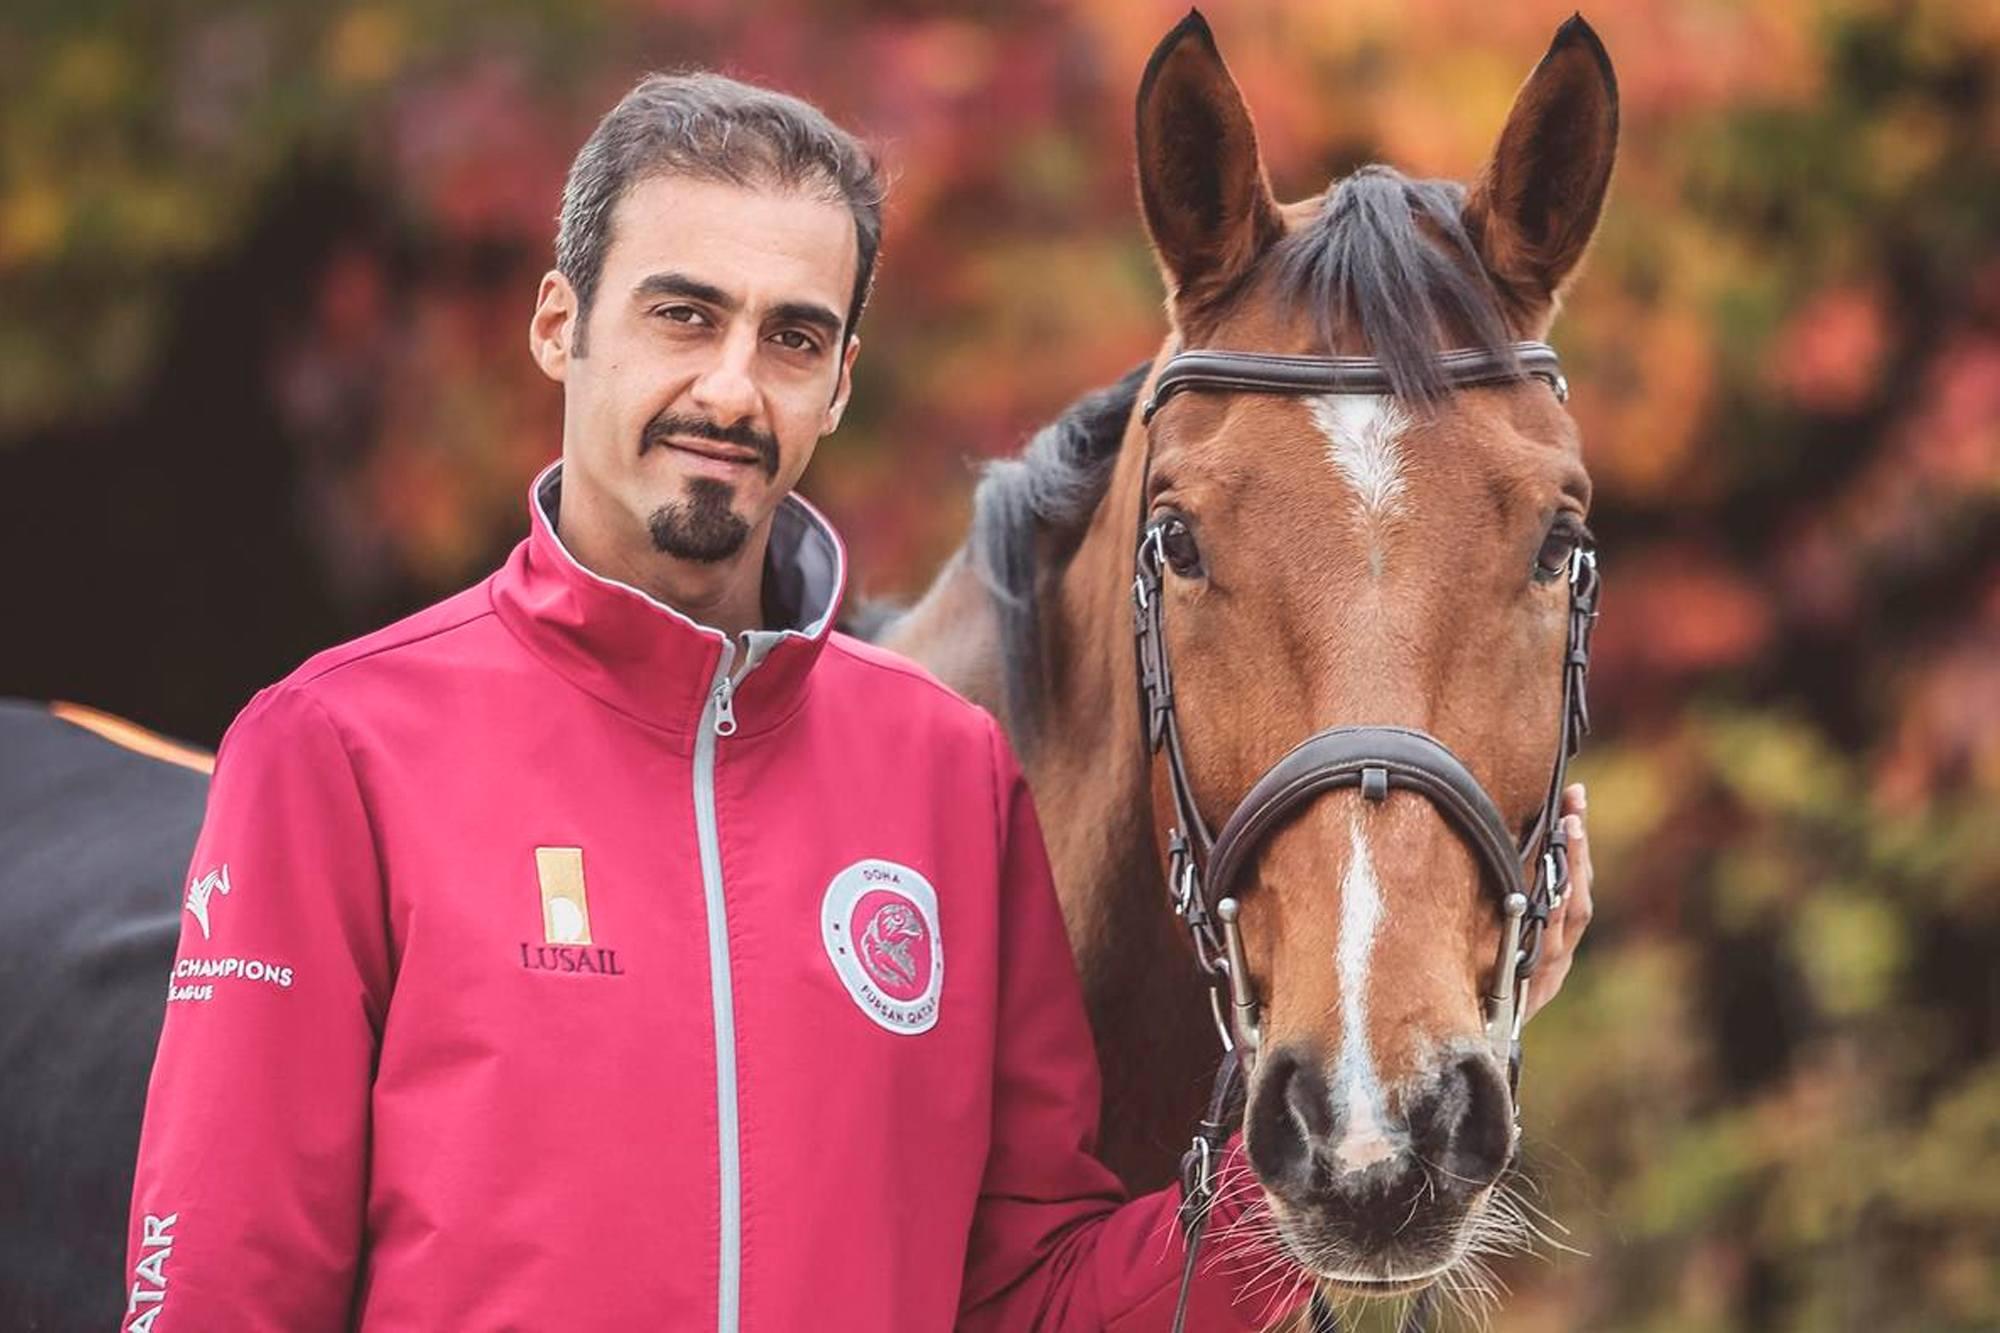 Sheikh Ali Bin Khalid Al Thani